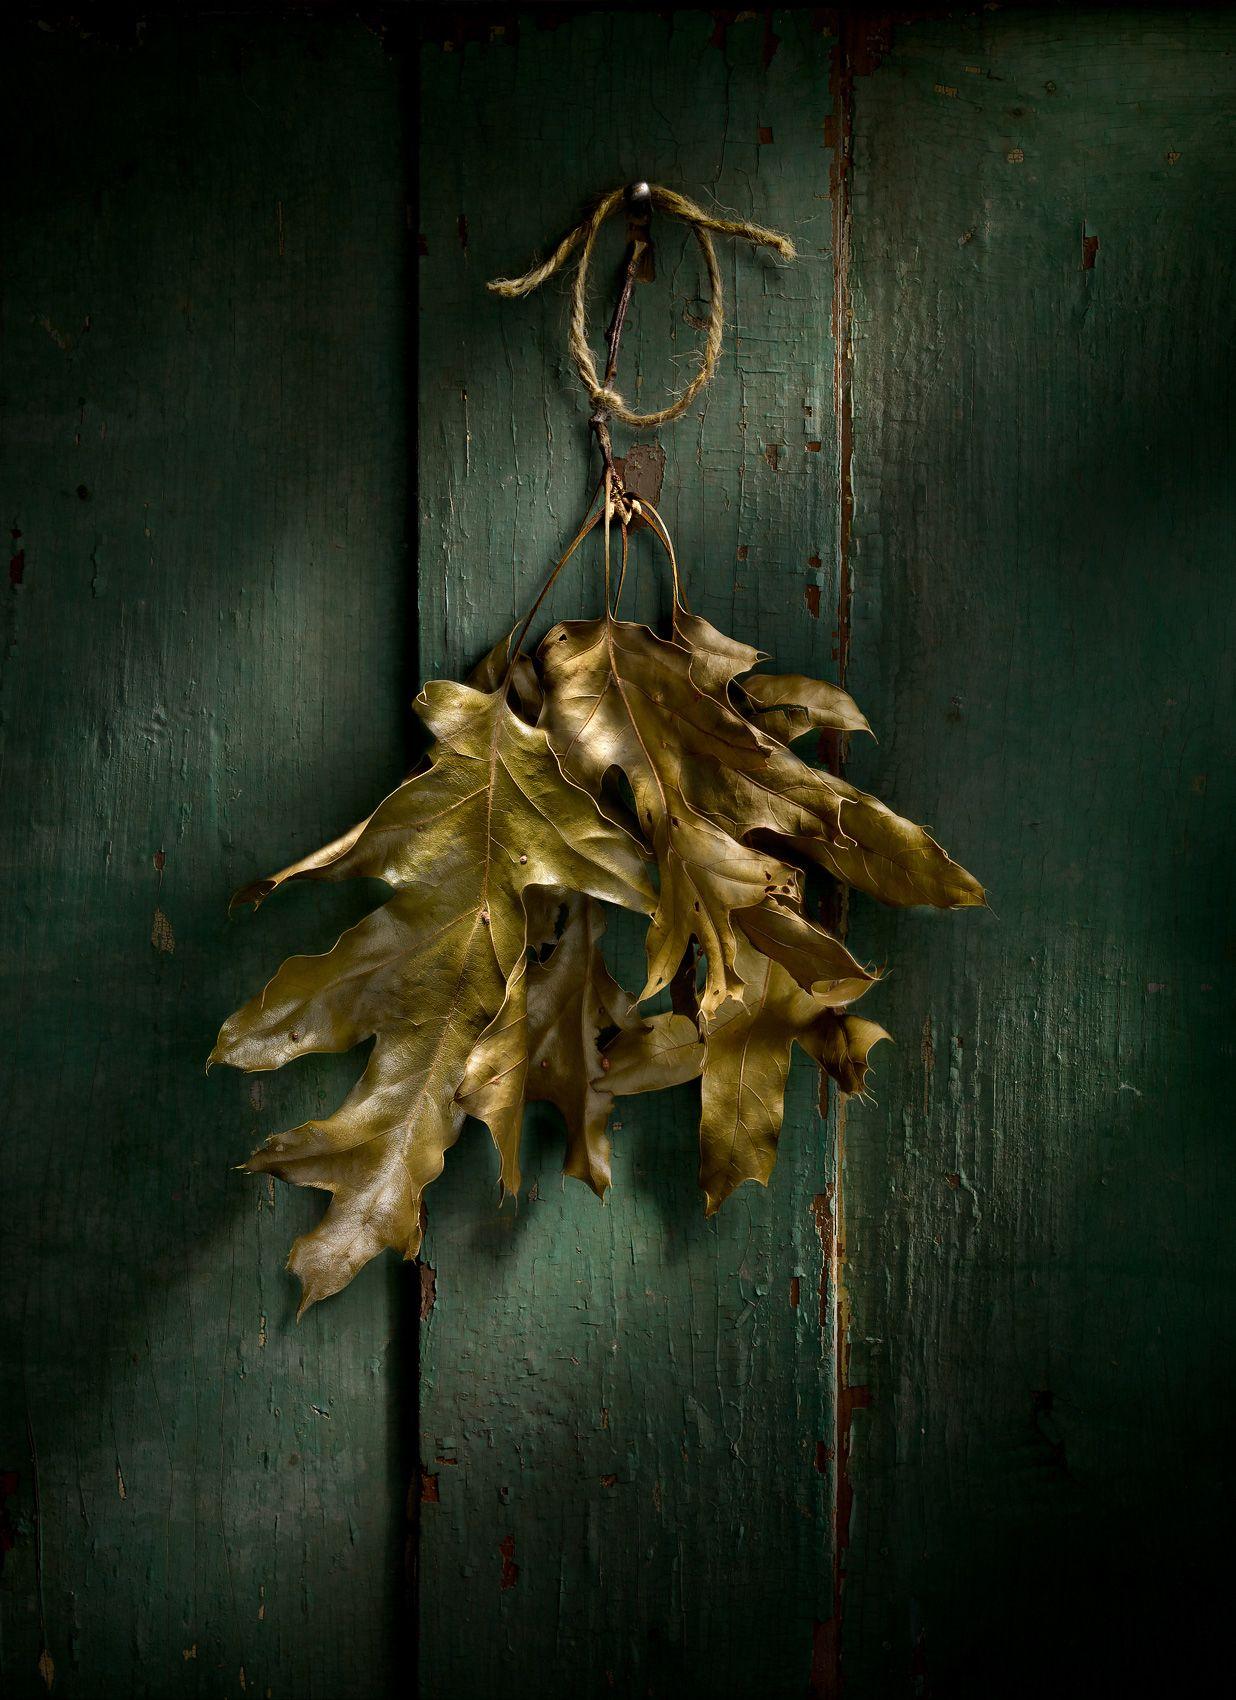 Leaves On Door by Harold Ross